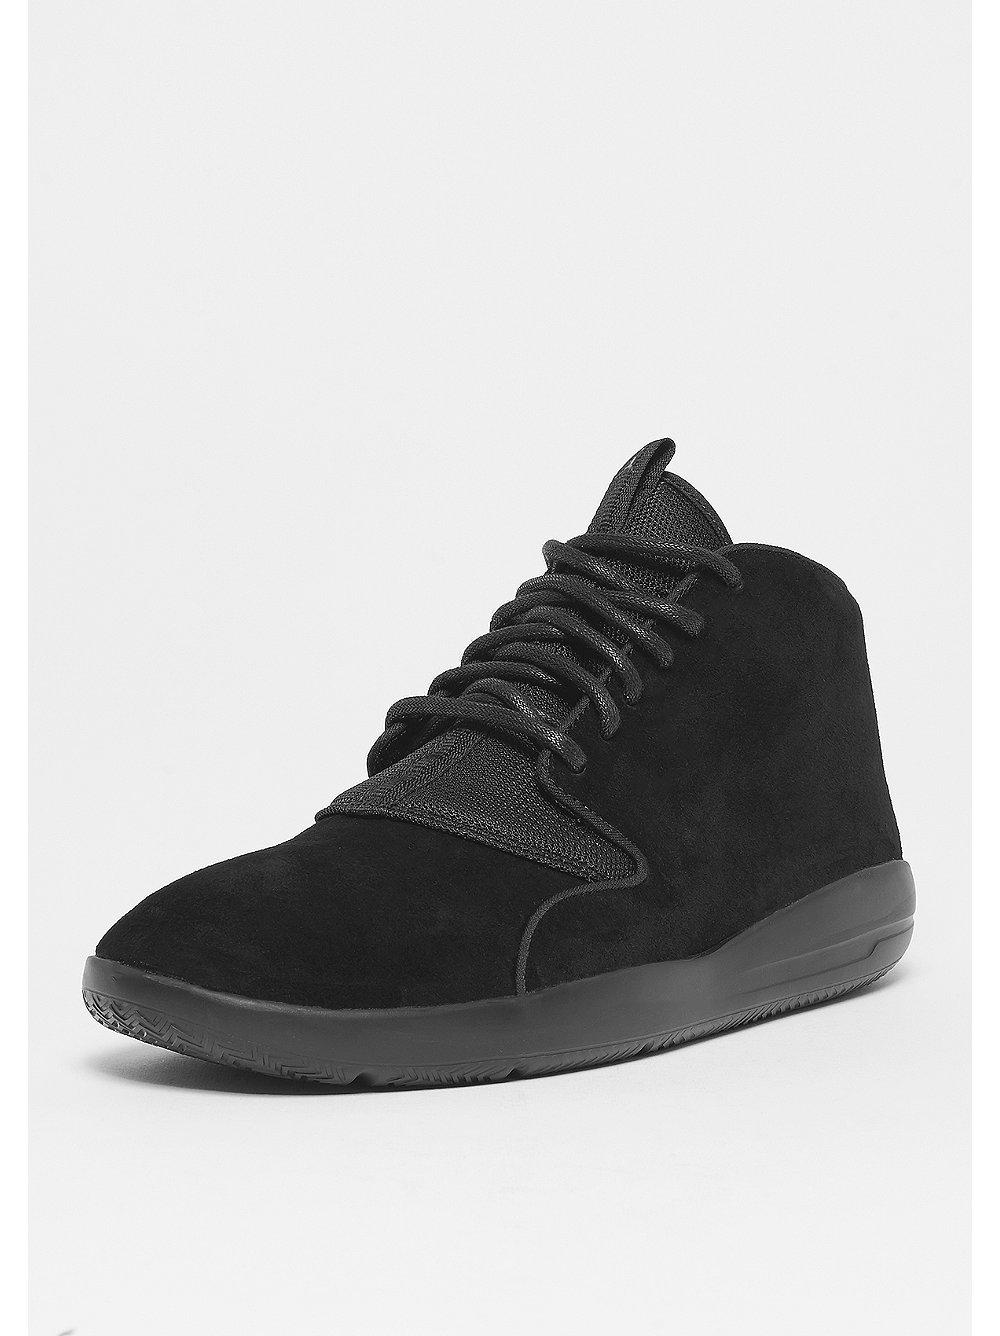 327c88a80 Jordan Eclipse Chukka Lea black black bei SNIPES bestellen